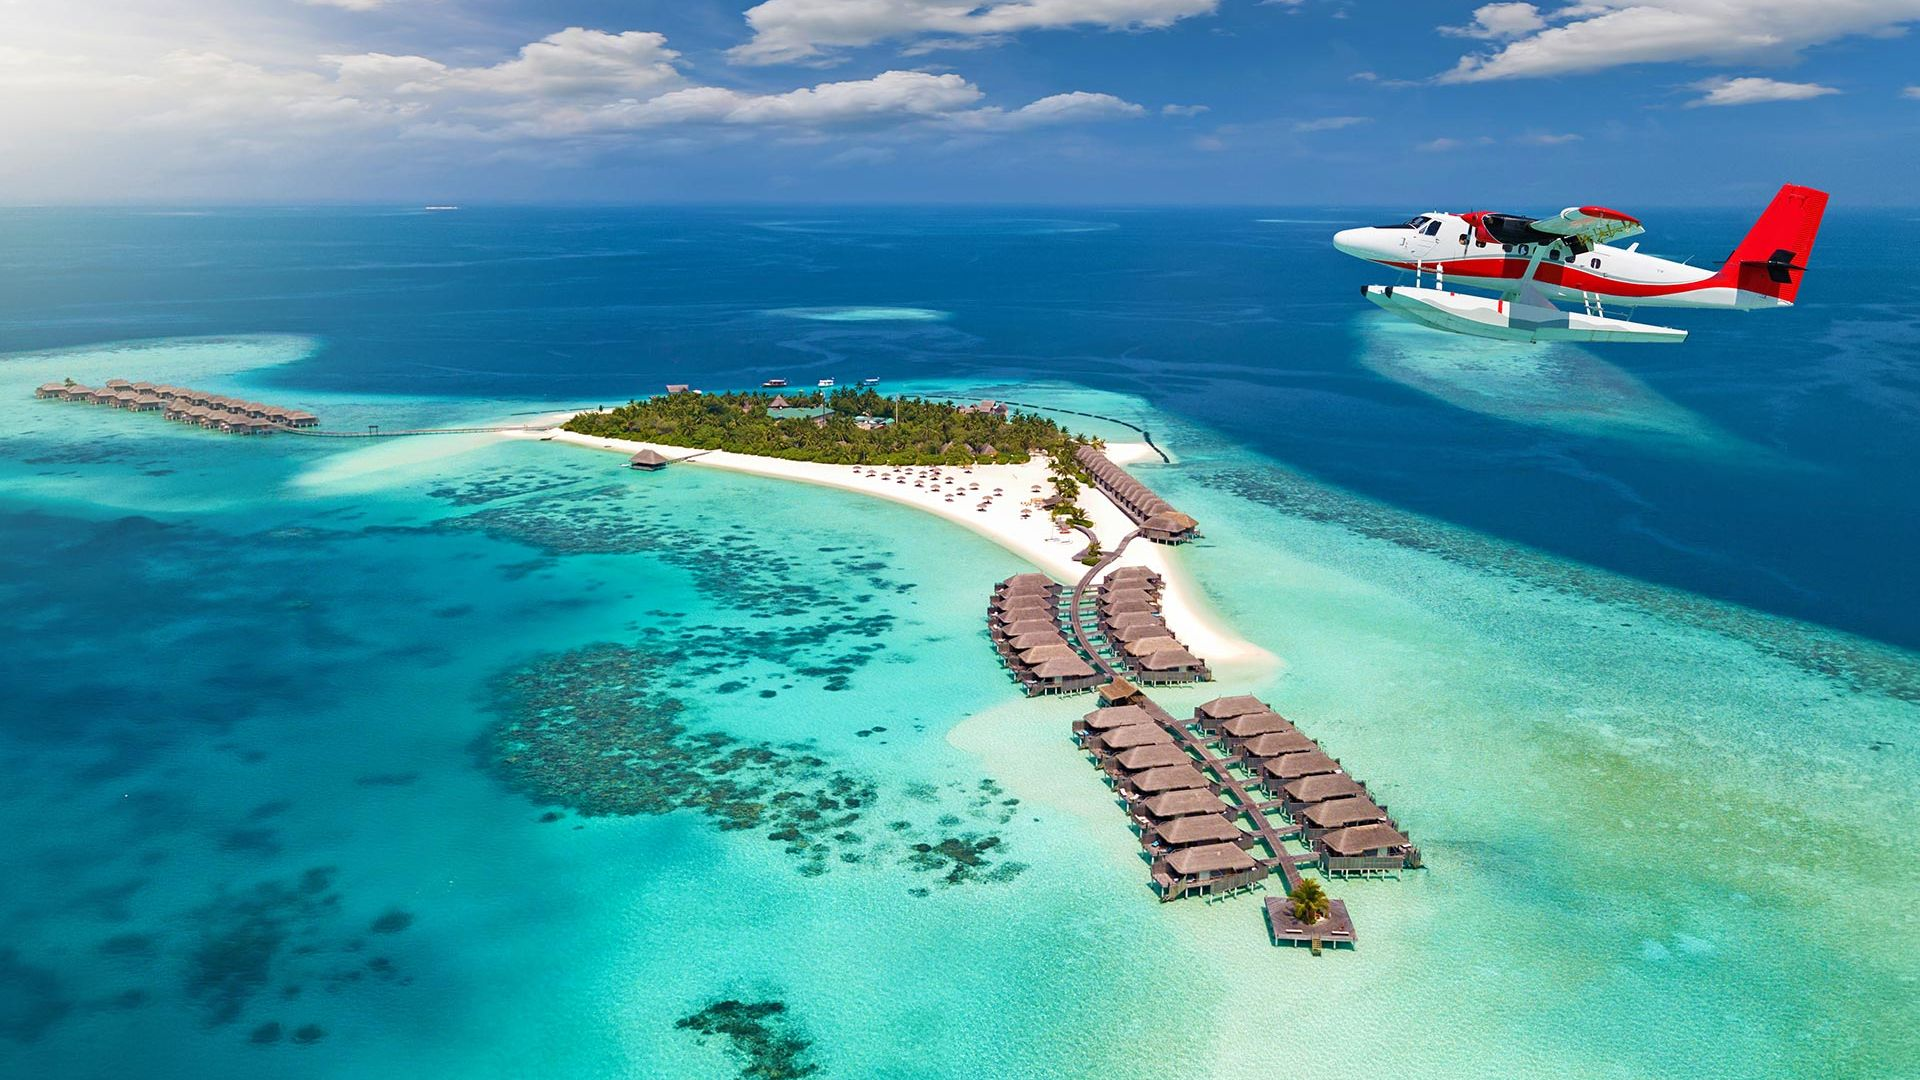 Sejur charter Maldive, 10 zile - februarie 2022